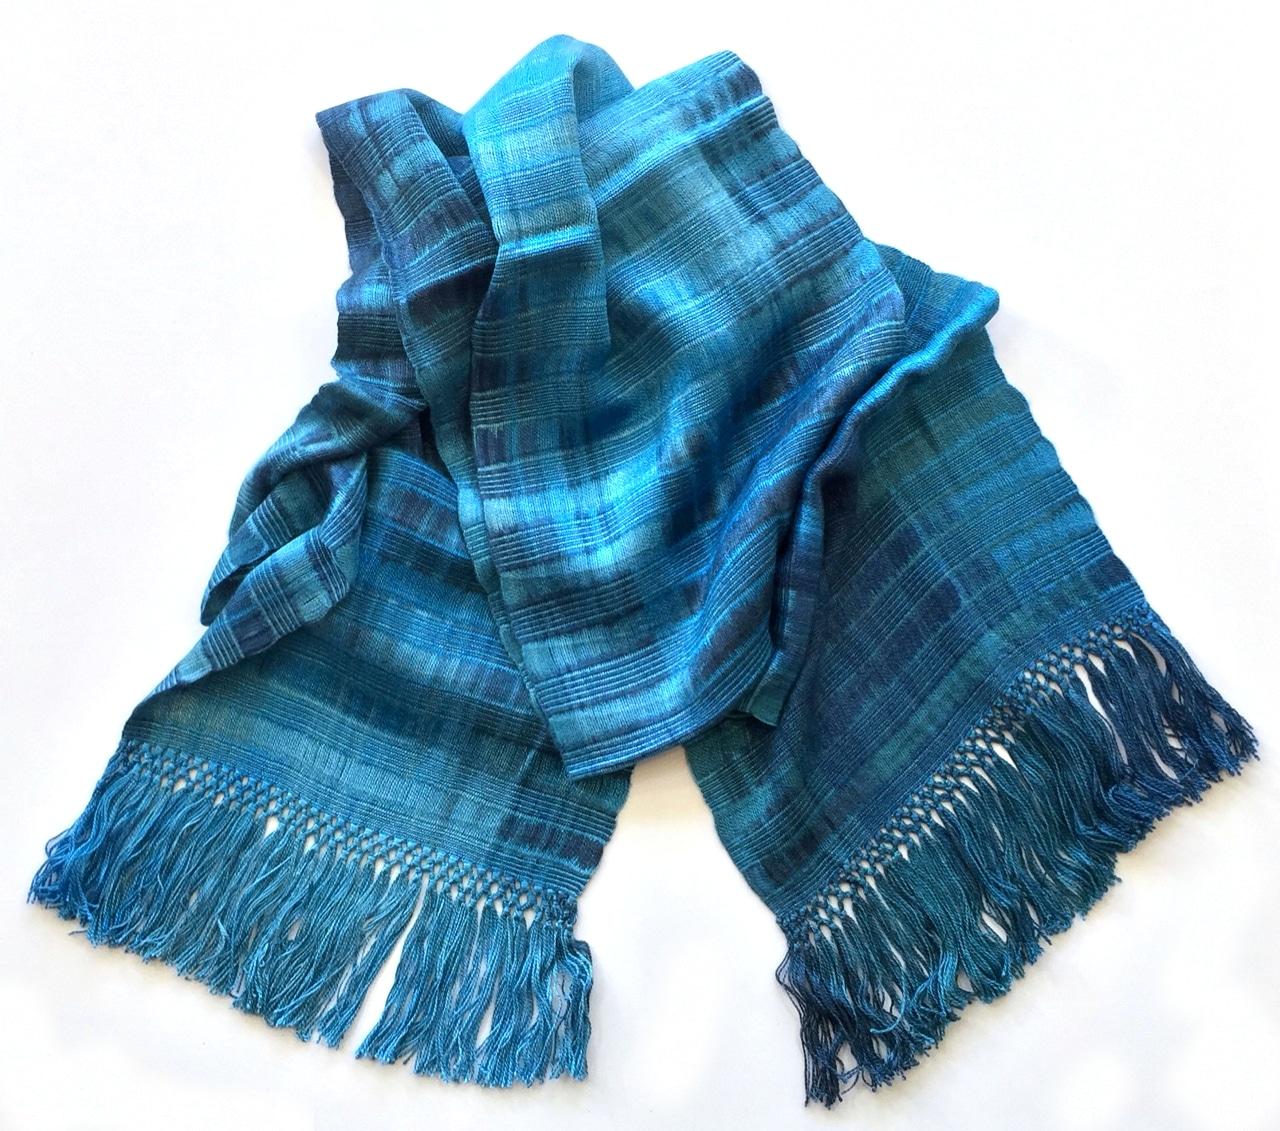 Blues - Lightweight Bamboo Open-Weave Handwoven Scarf 8 x 68